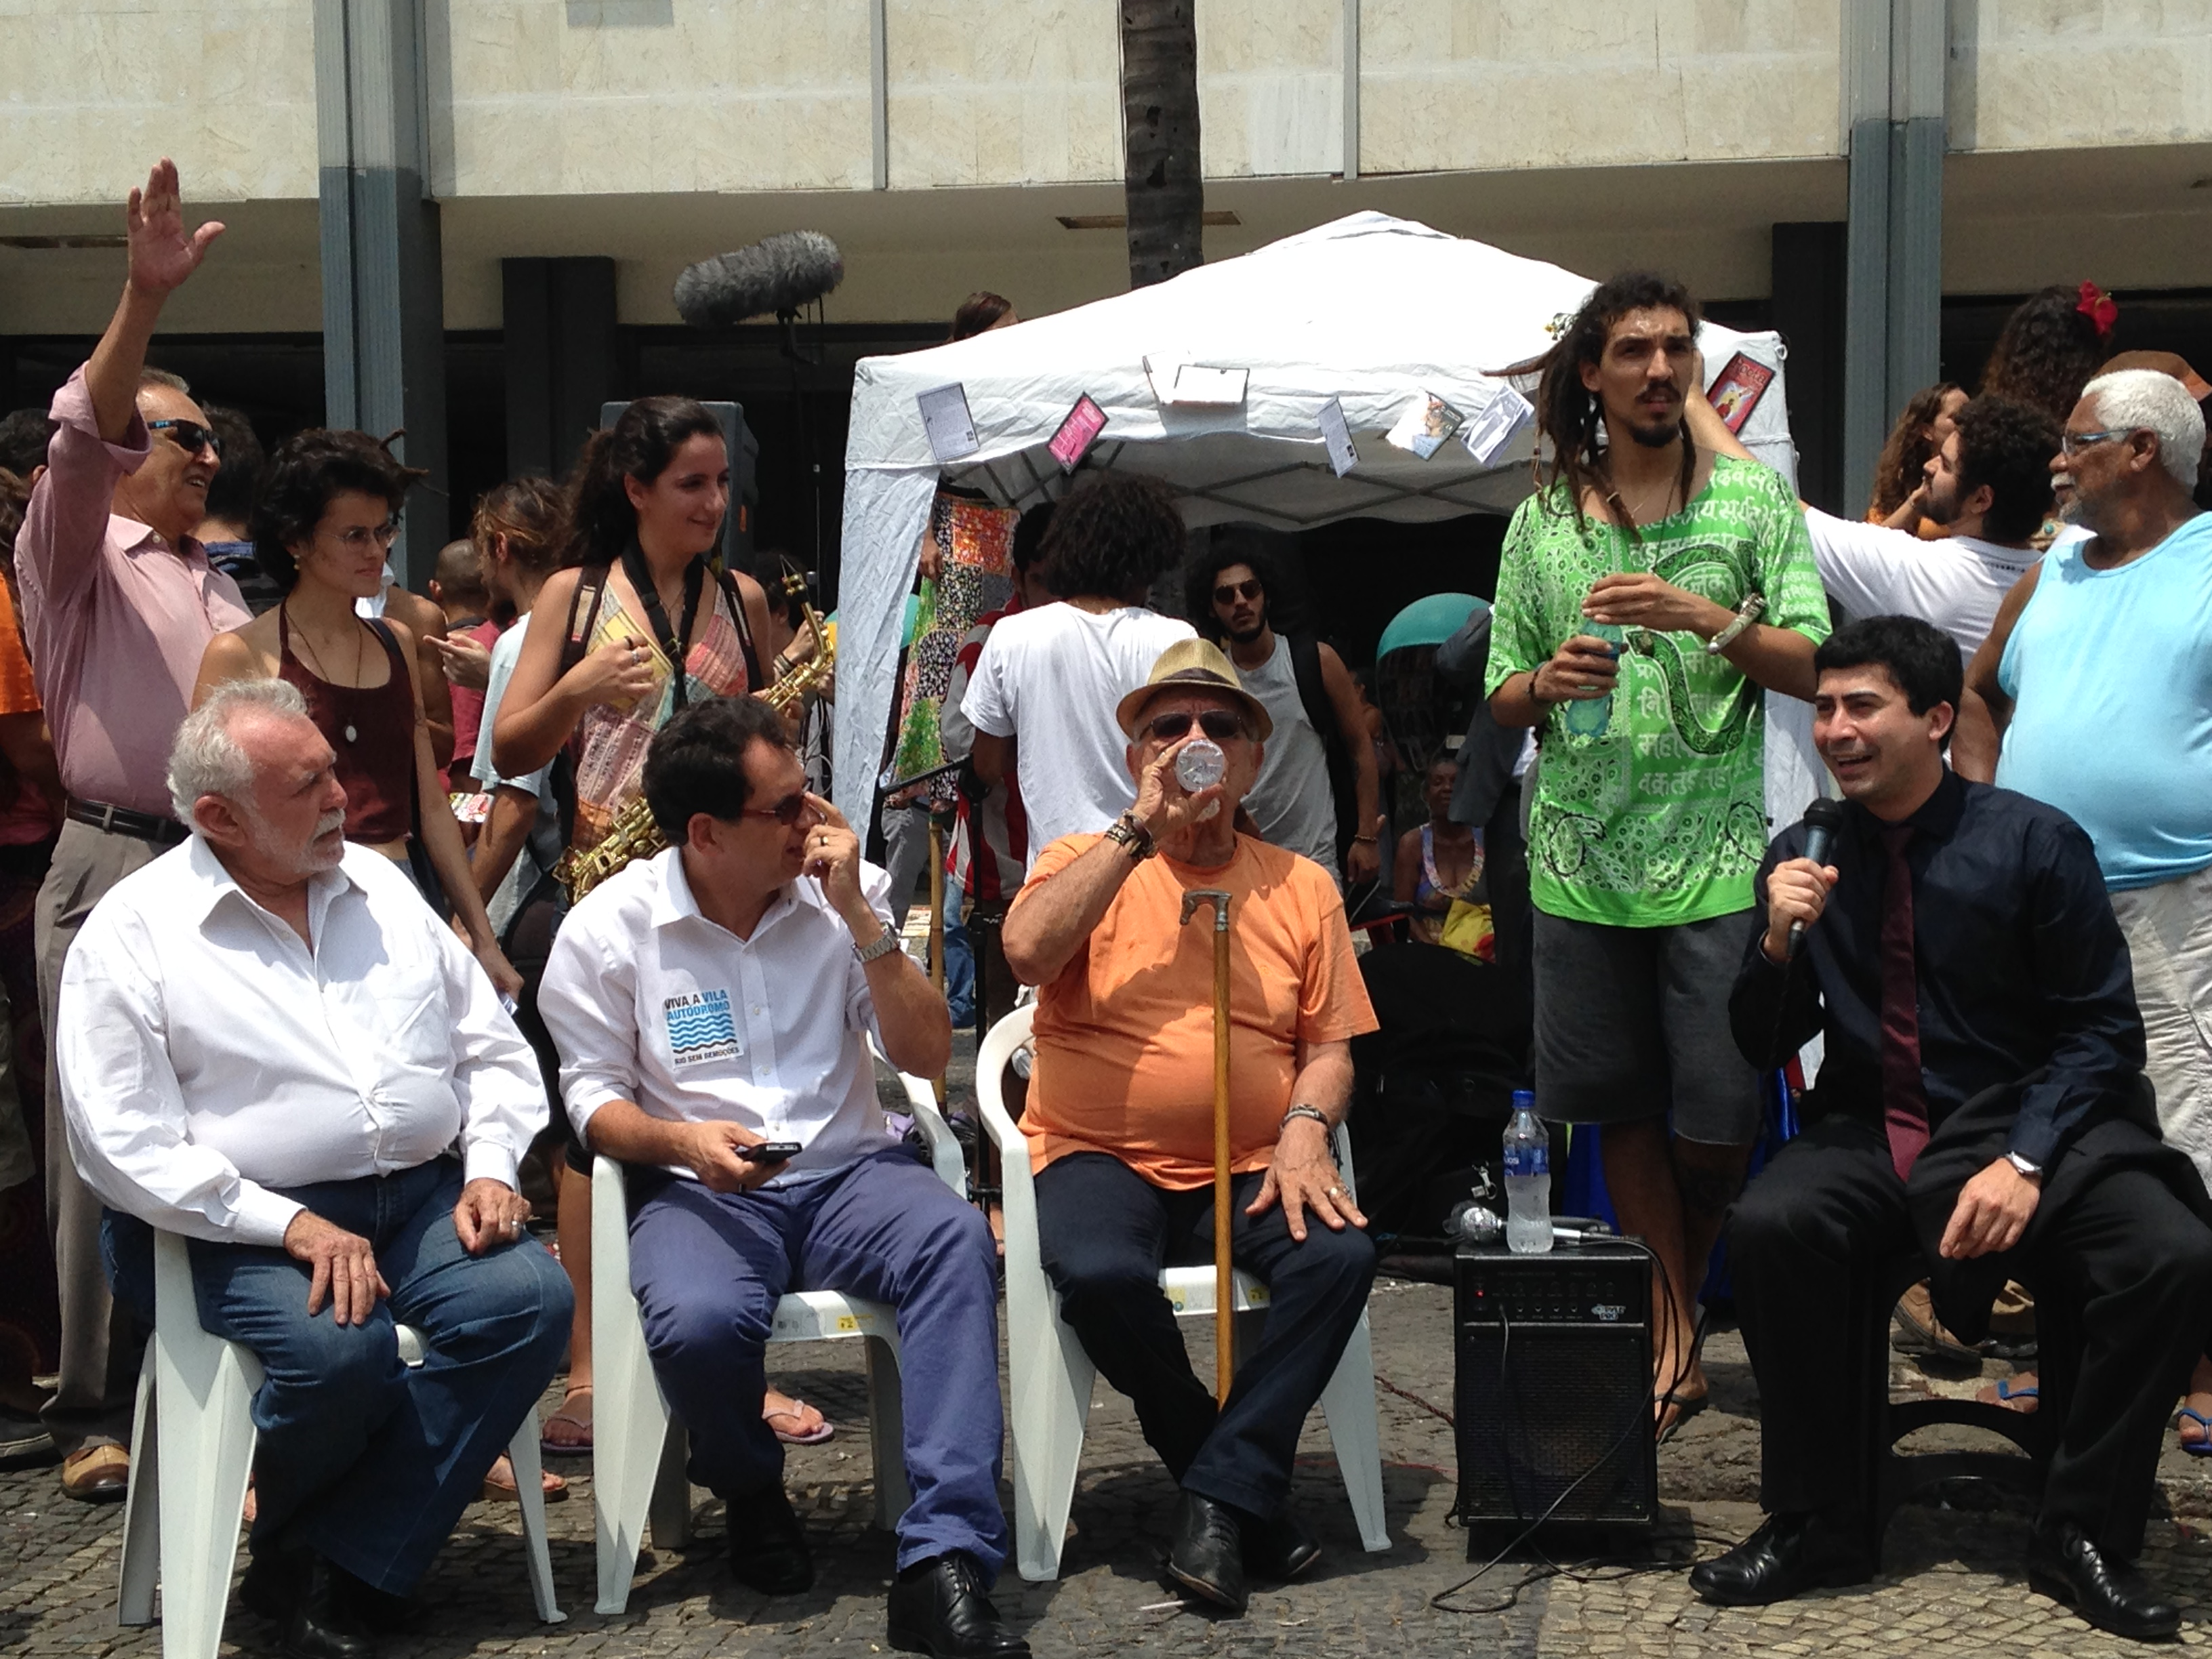 Roda de Conversa discutindo arte pública. Foto: Rodolfo Targino / Agência Biblioo